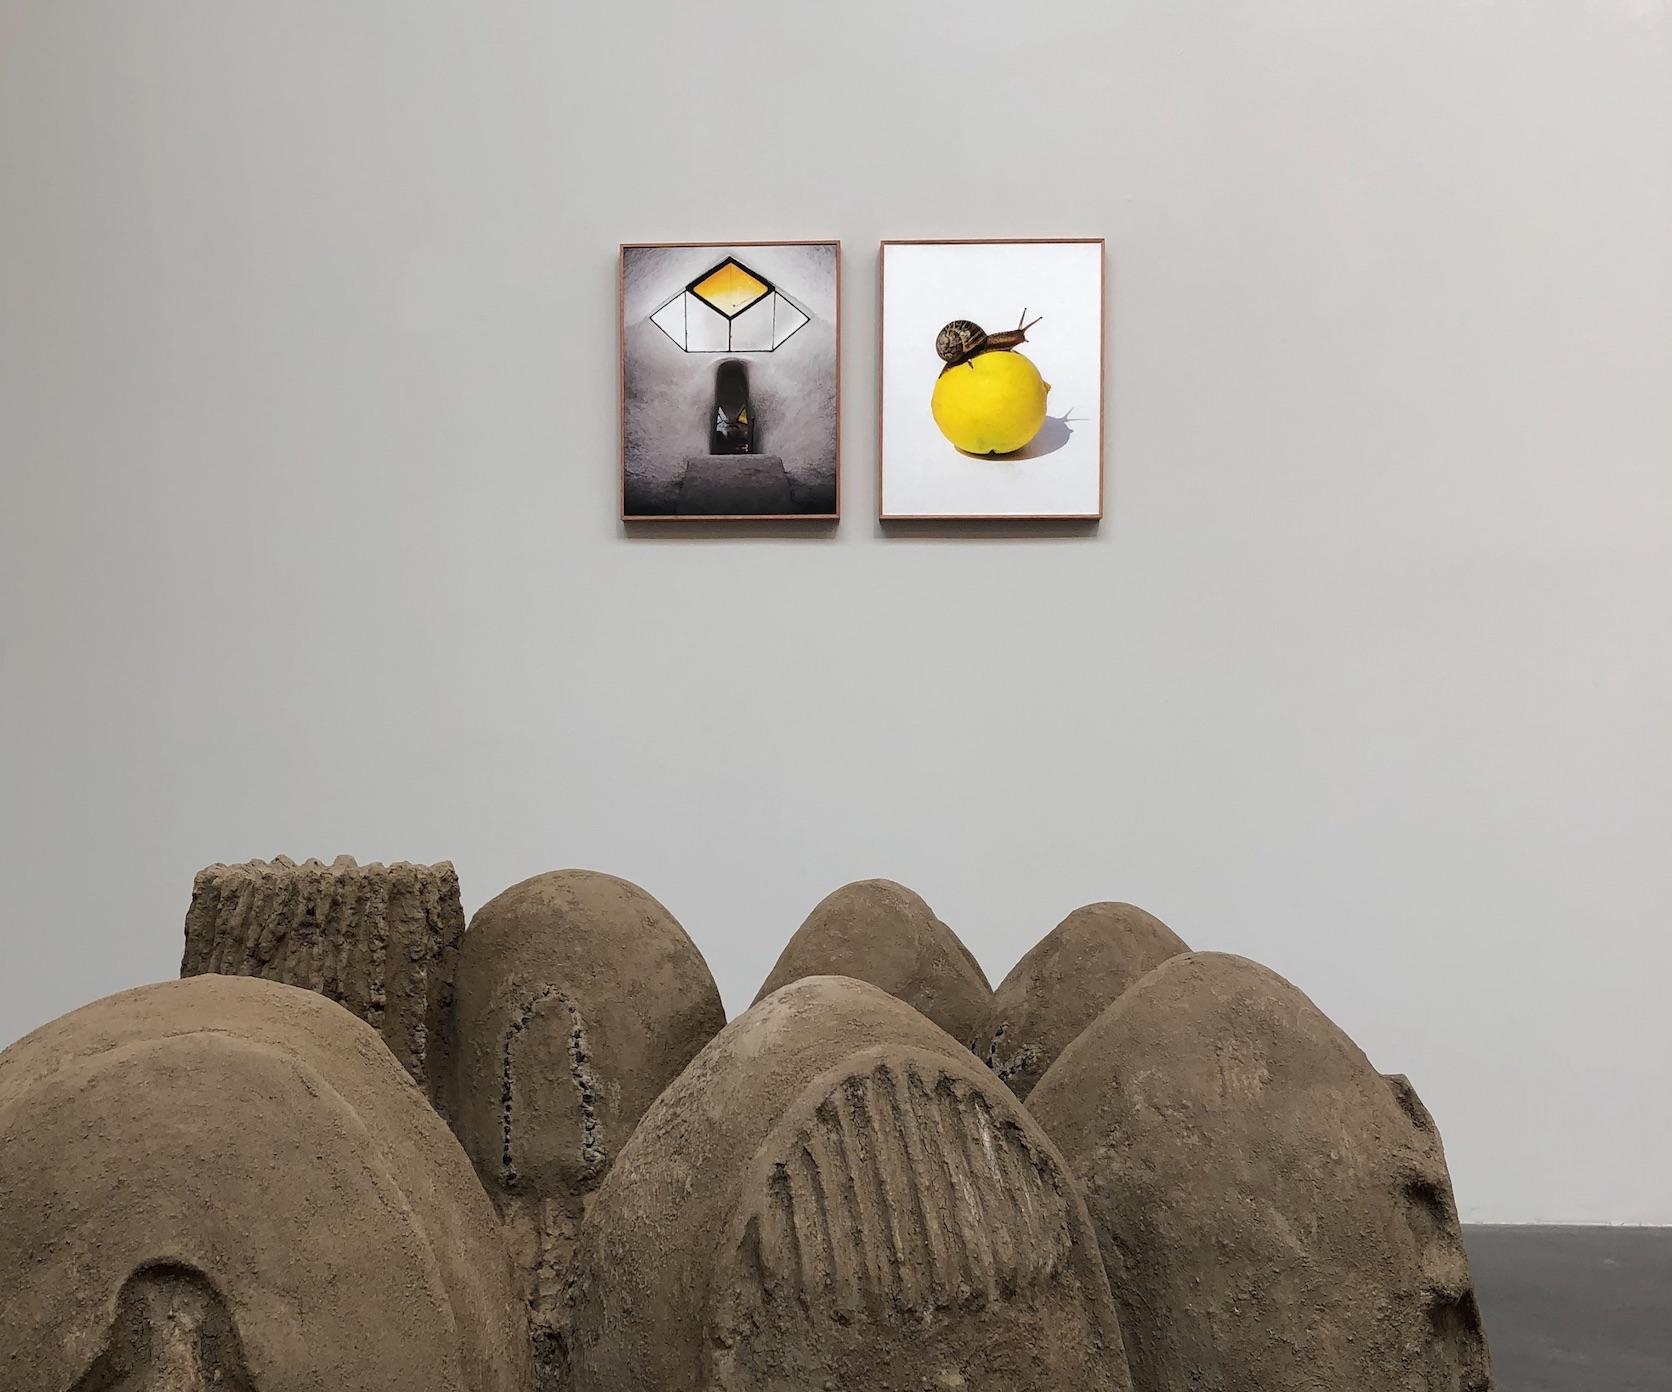 Galería Agustina Ferreyra, Ramiro Chaves & Ulrik López. Kurimanzutto, Mexico City, 2021. Photo: Onda MX